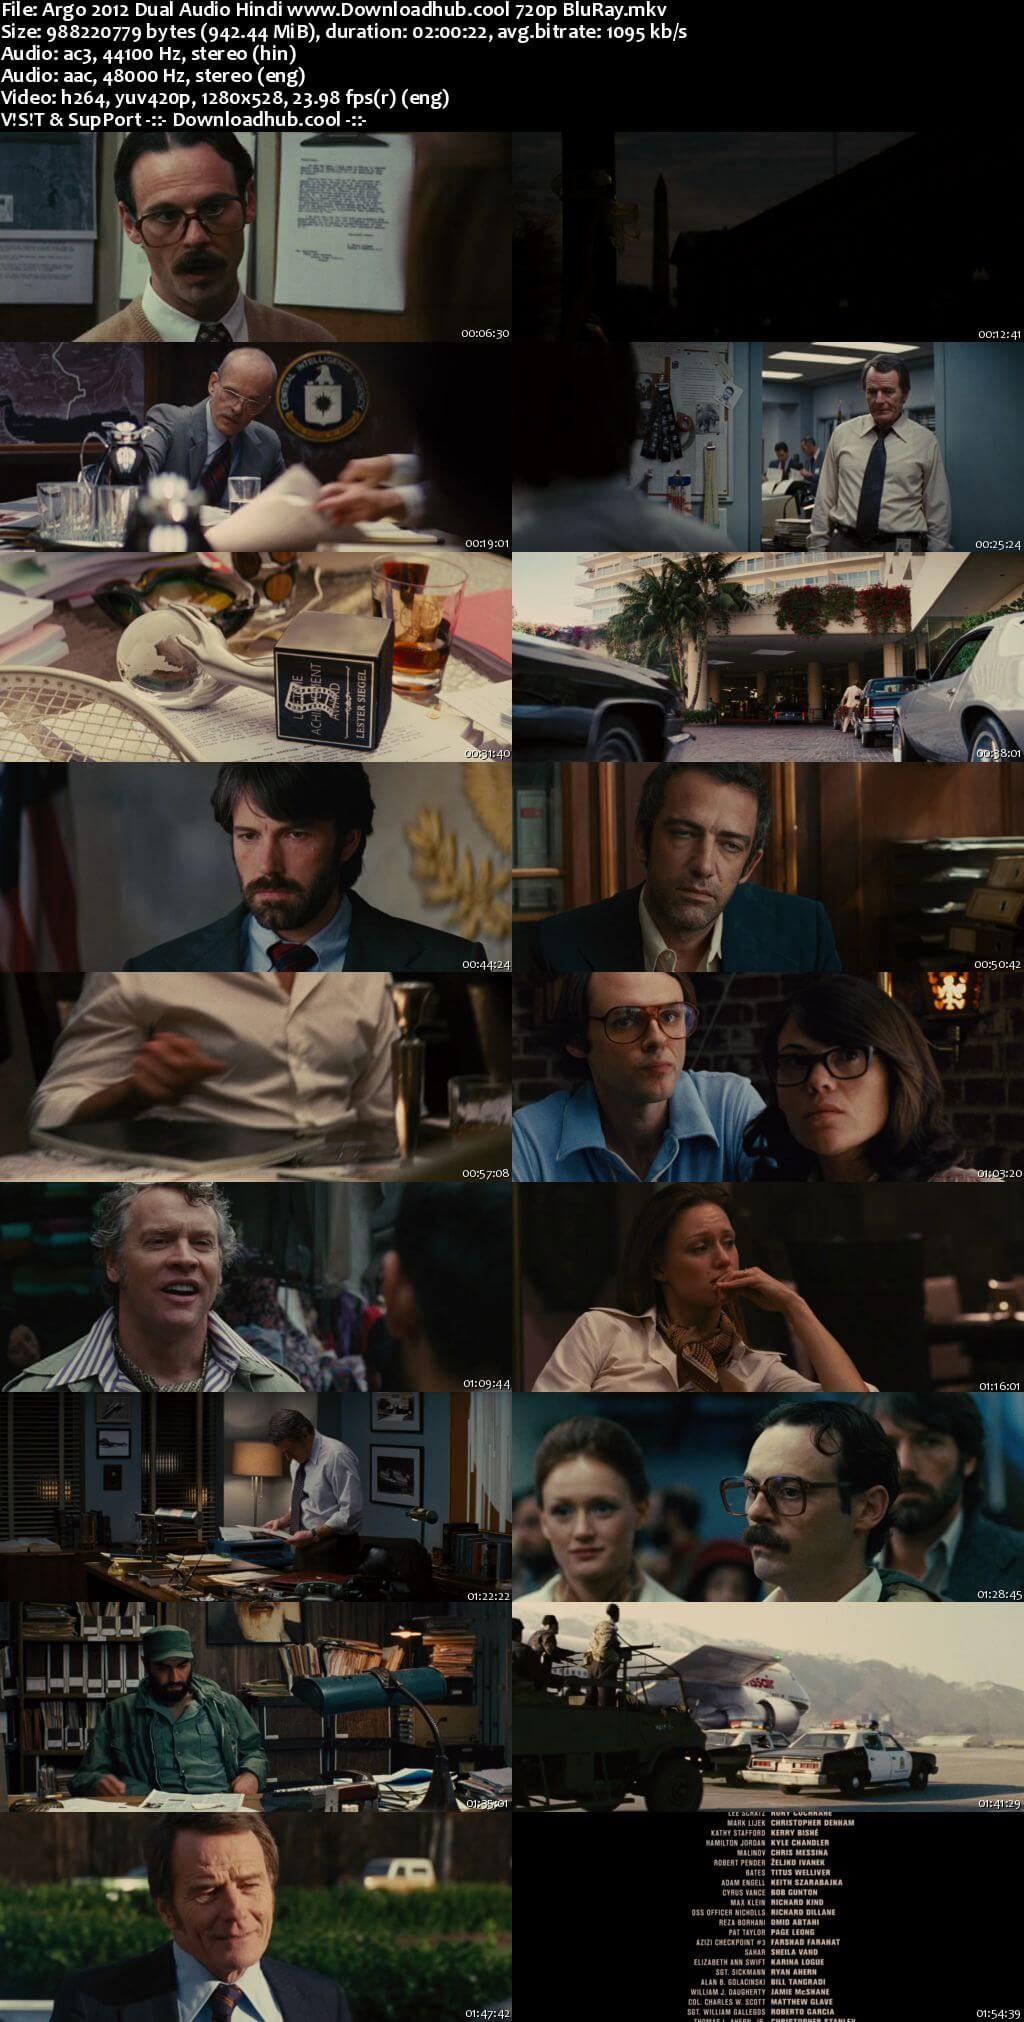 Argo 2012 Hindi Dual Audio 720p BluRay x264